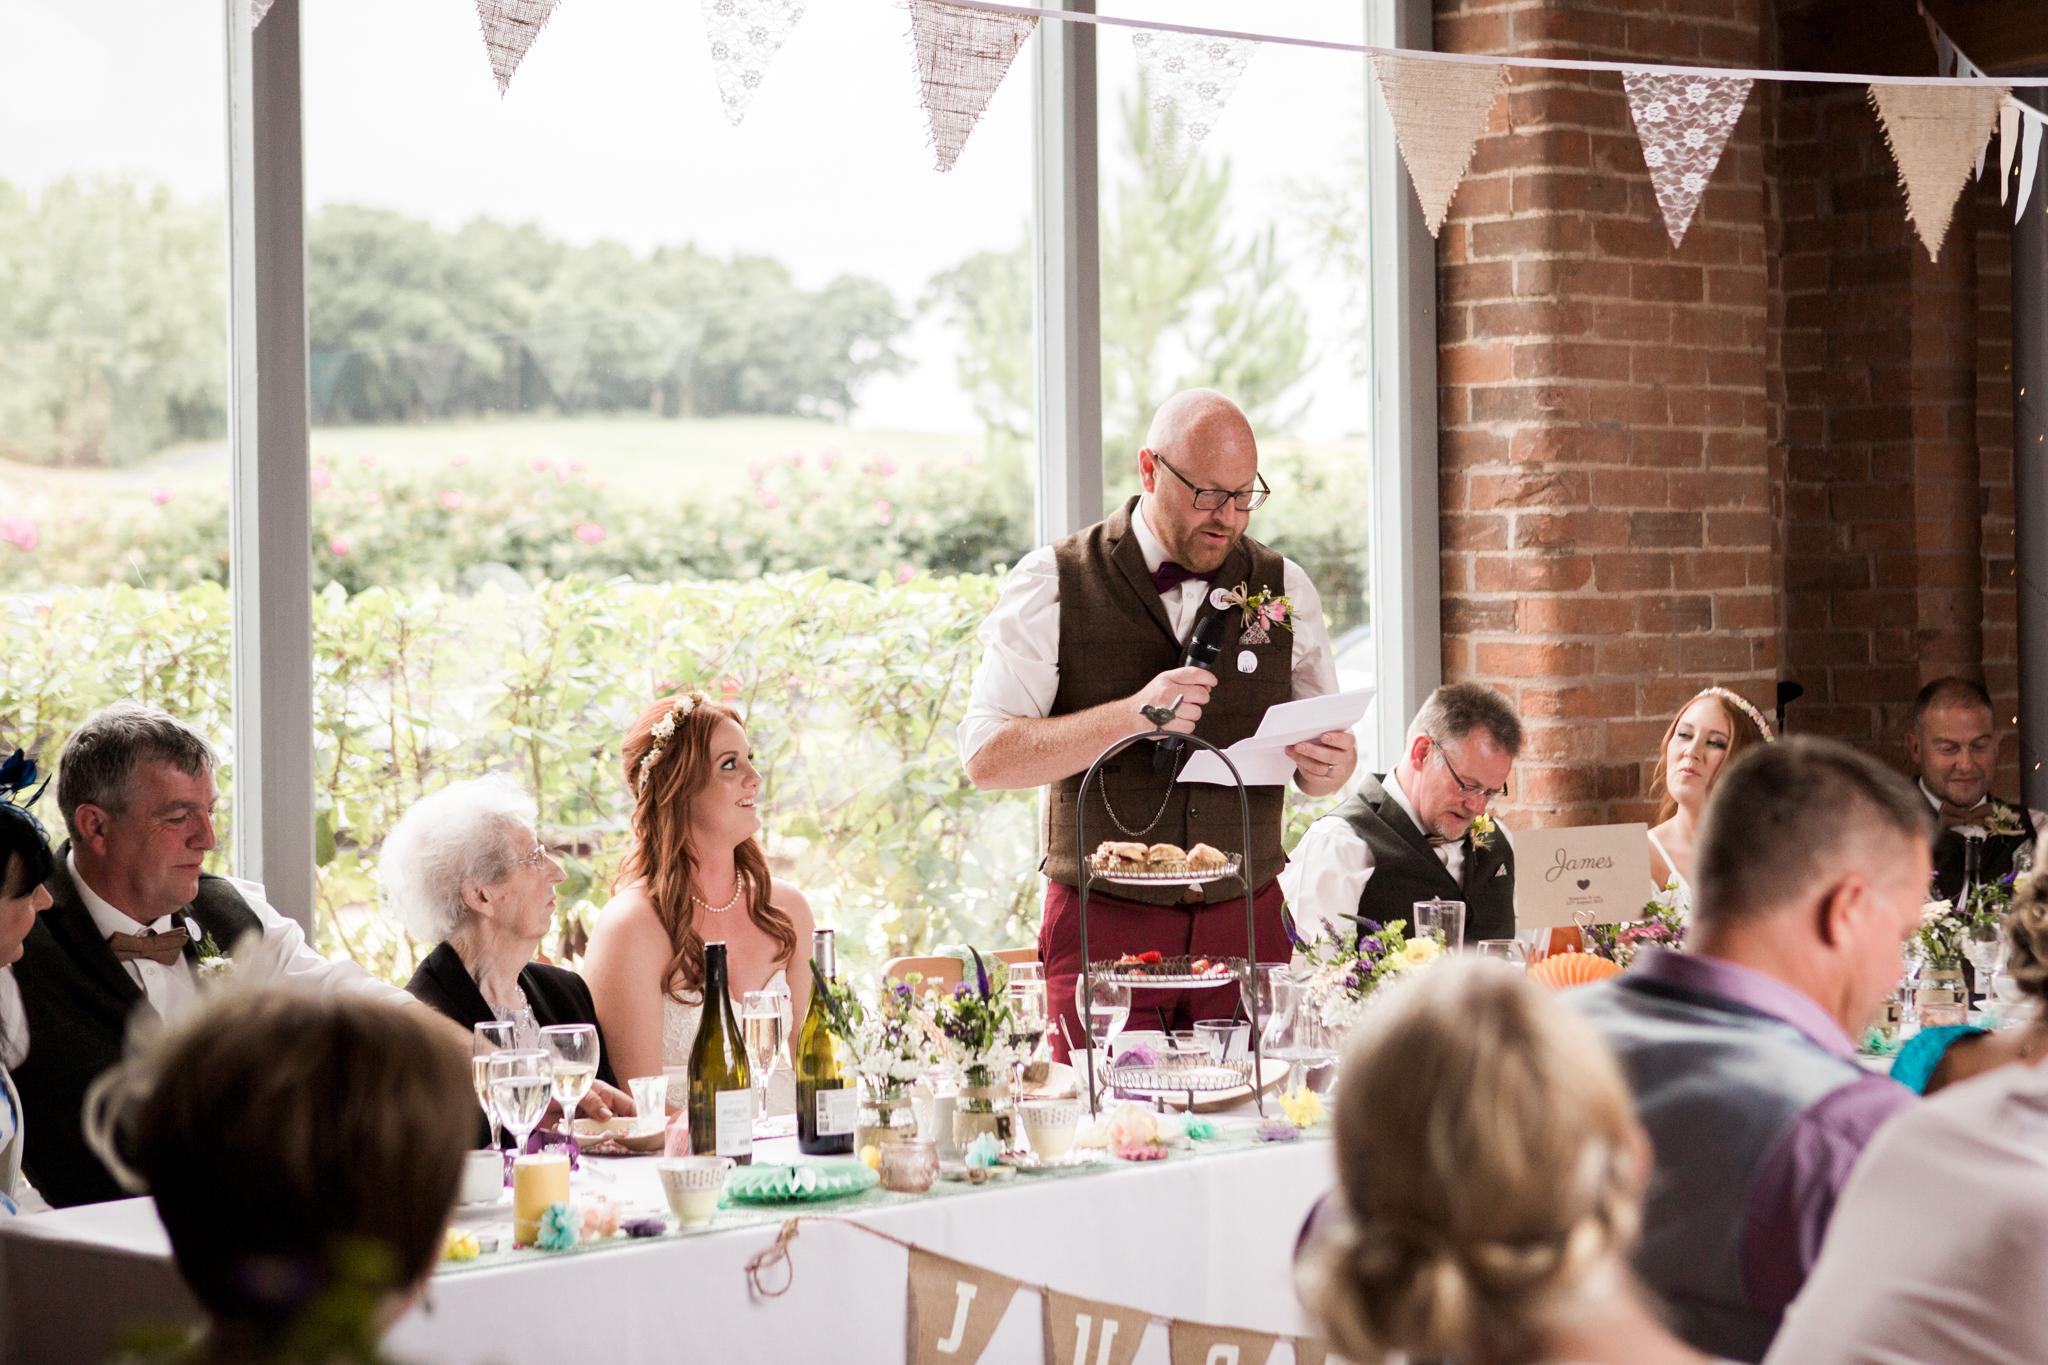 Rowsie & Lee, Swallows Nest Barn Wedding, Cotswold wedding photographer, Warwickshire Wedding Photographer-134.jpg